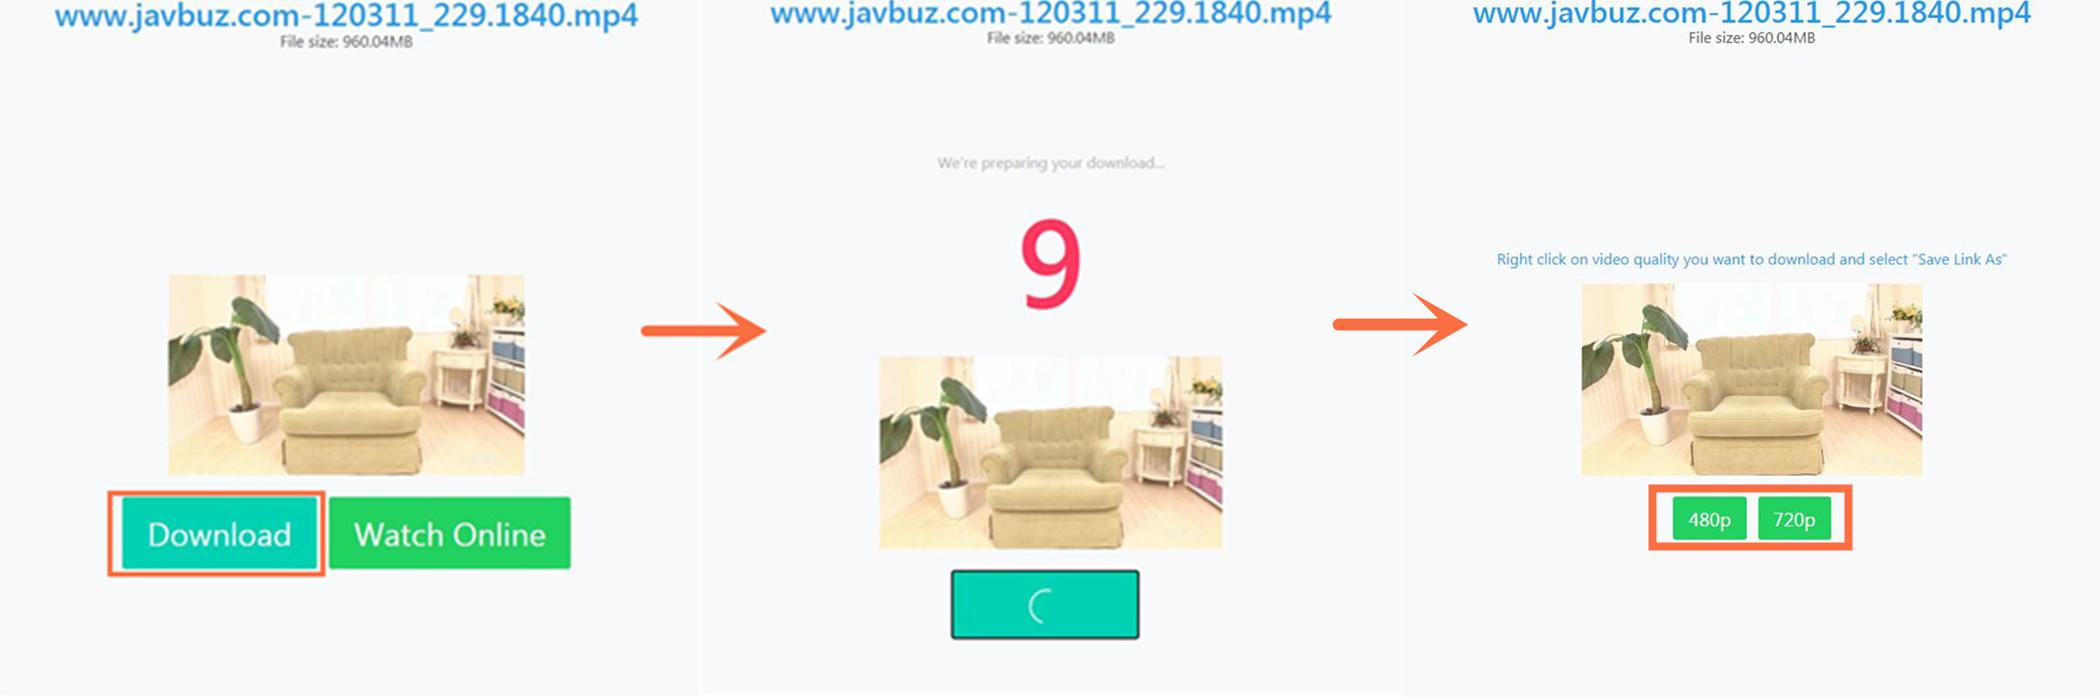 JavBuzからダウンロード-2